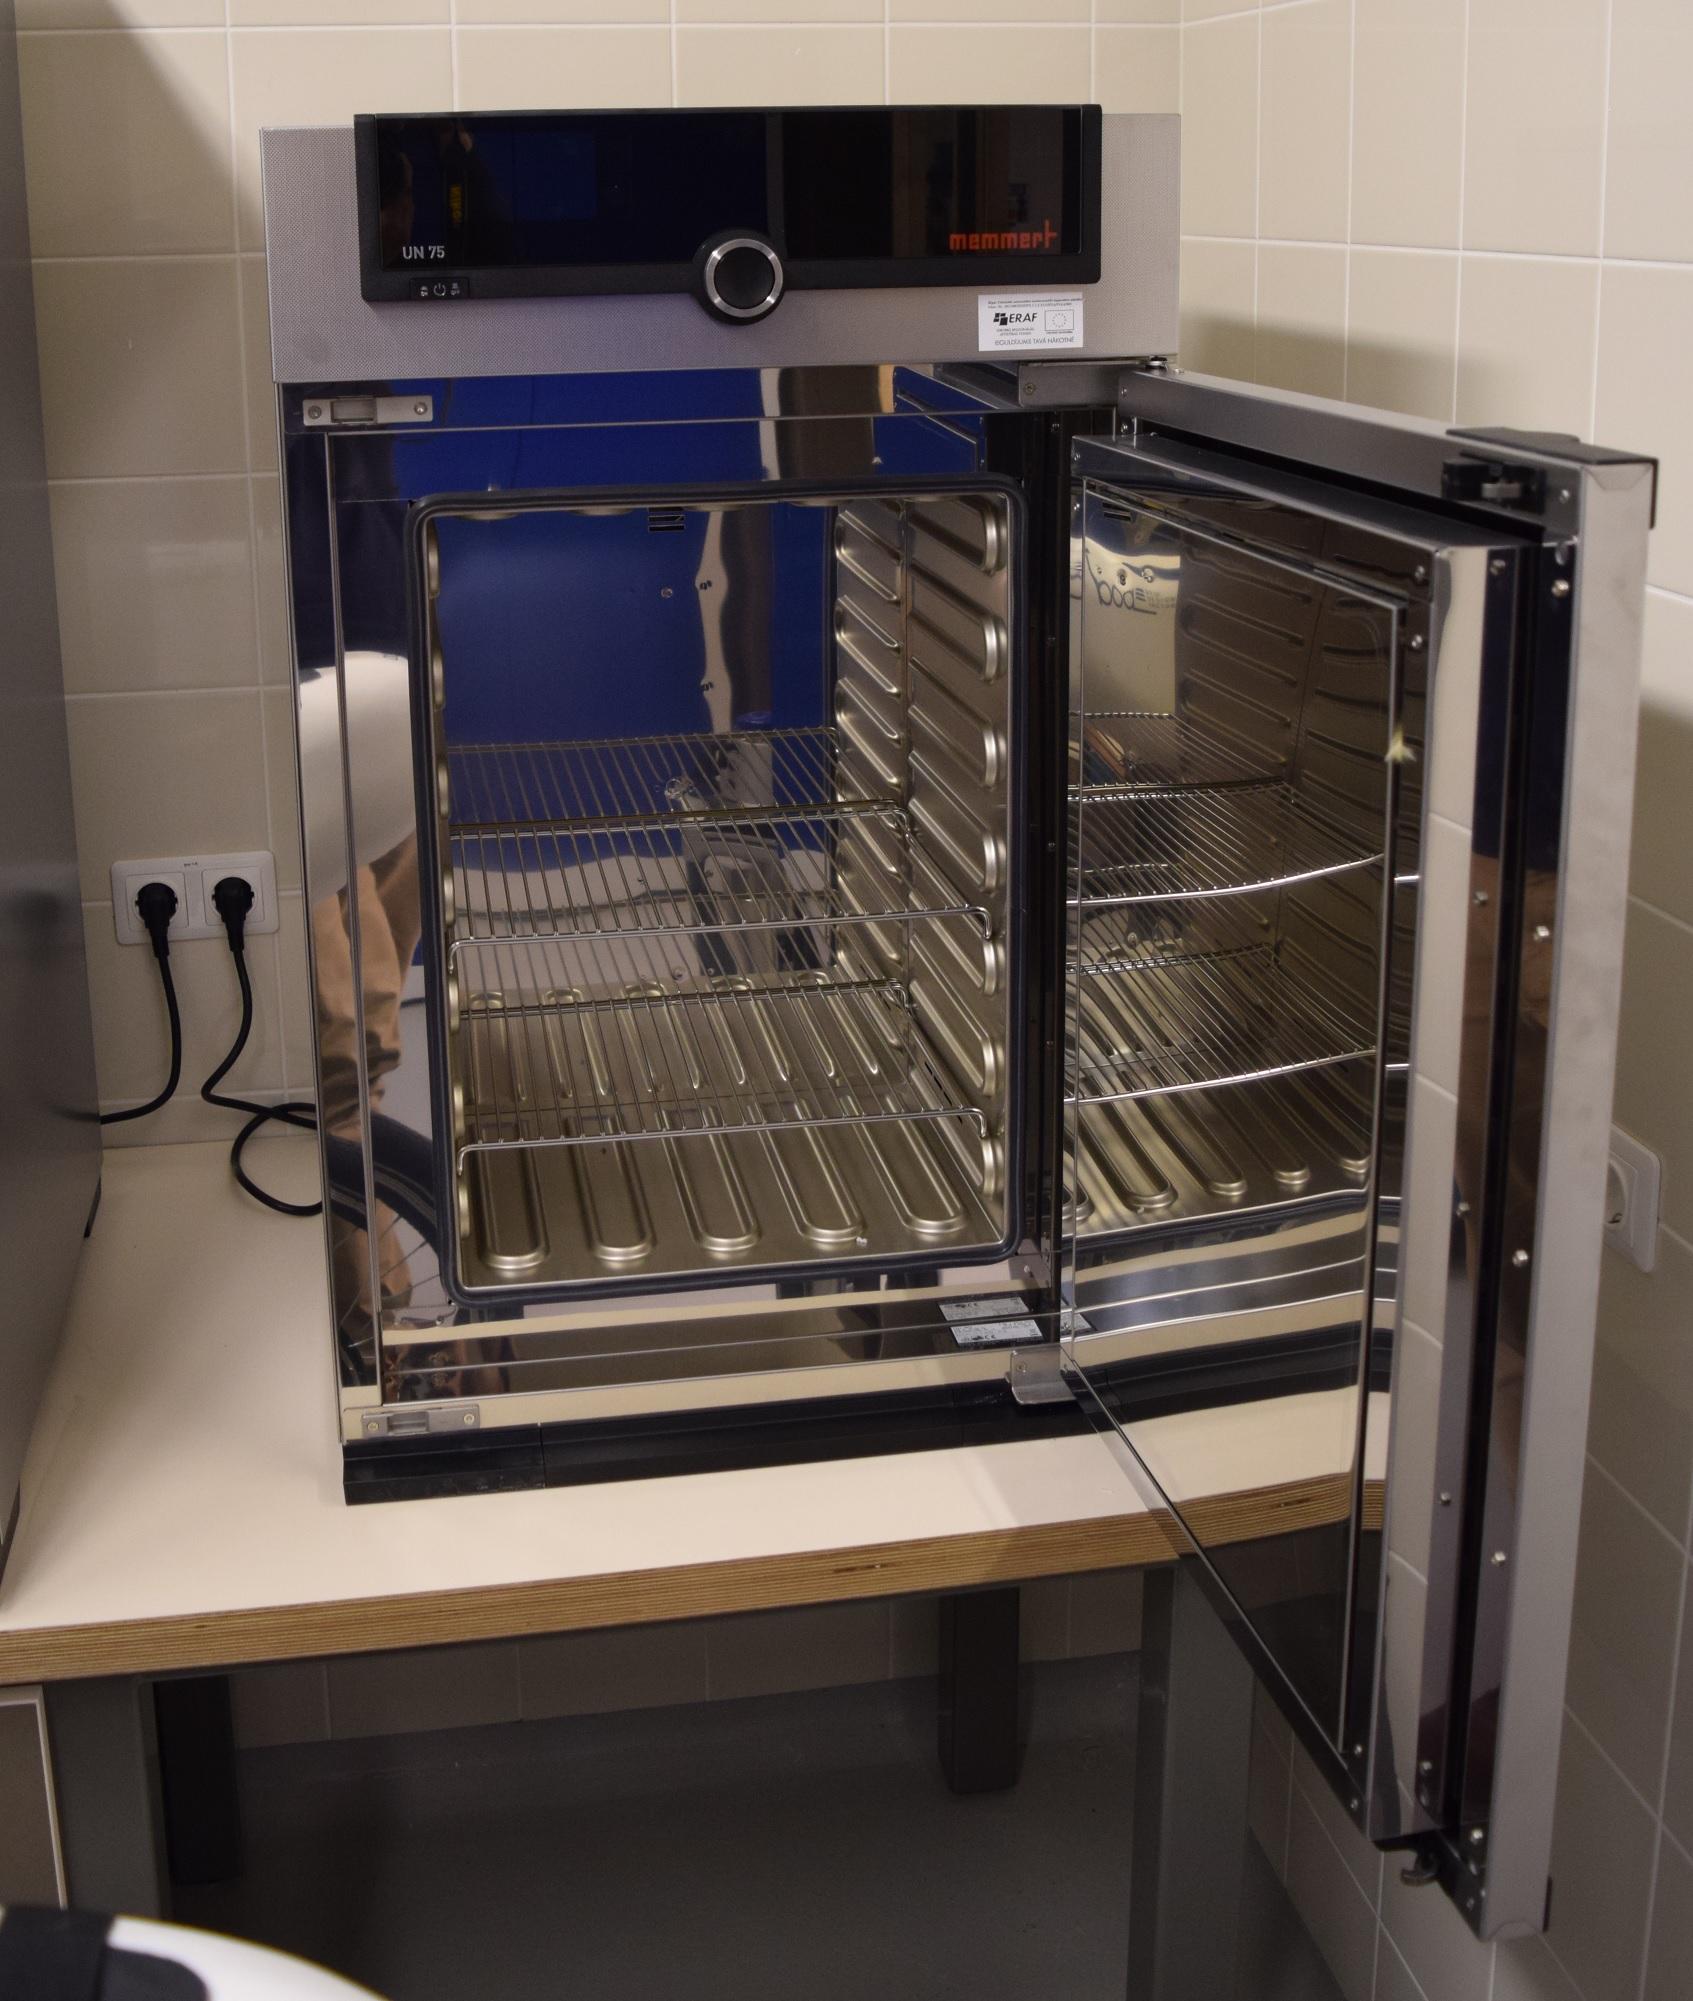 Universal Oven